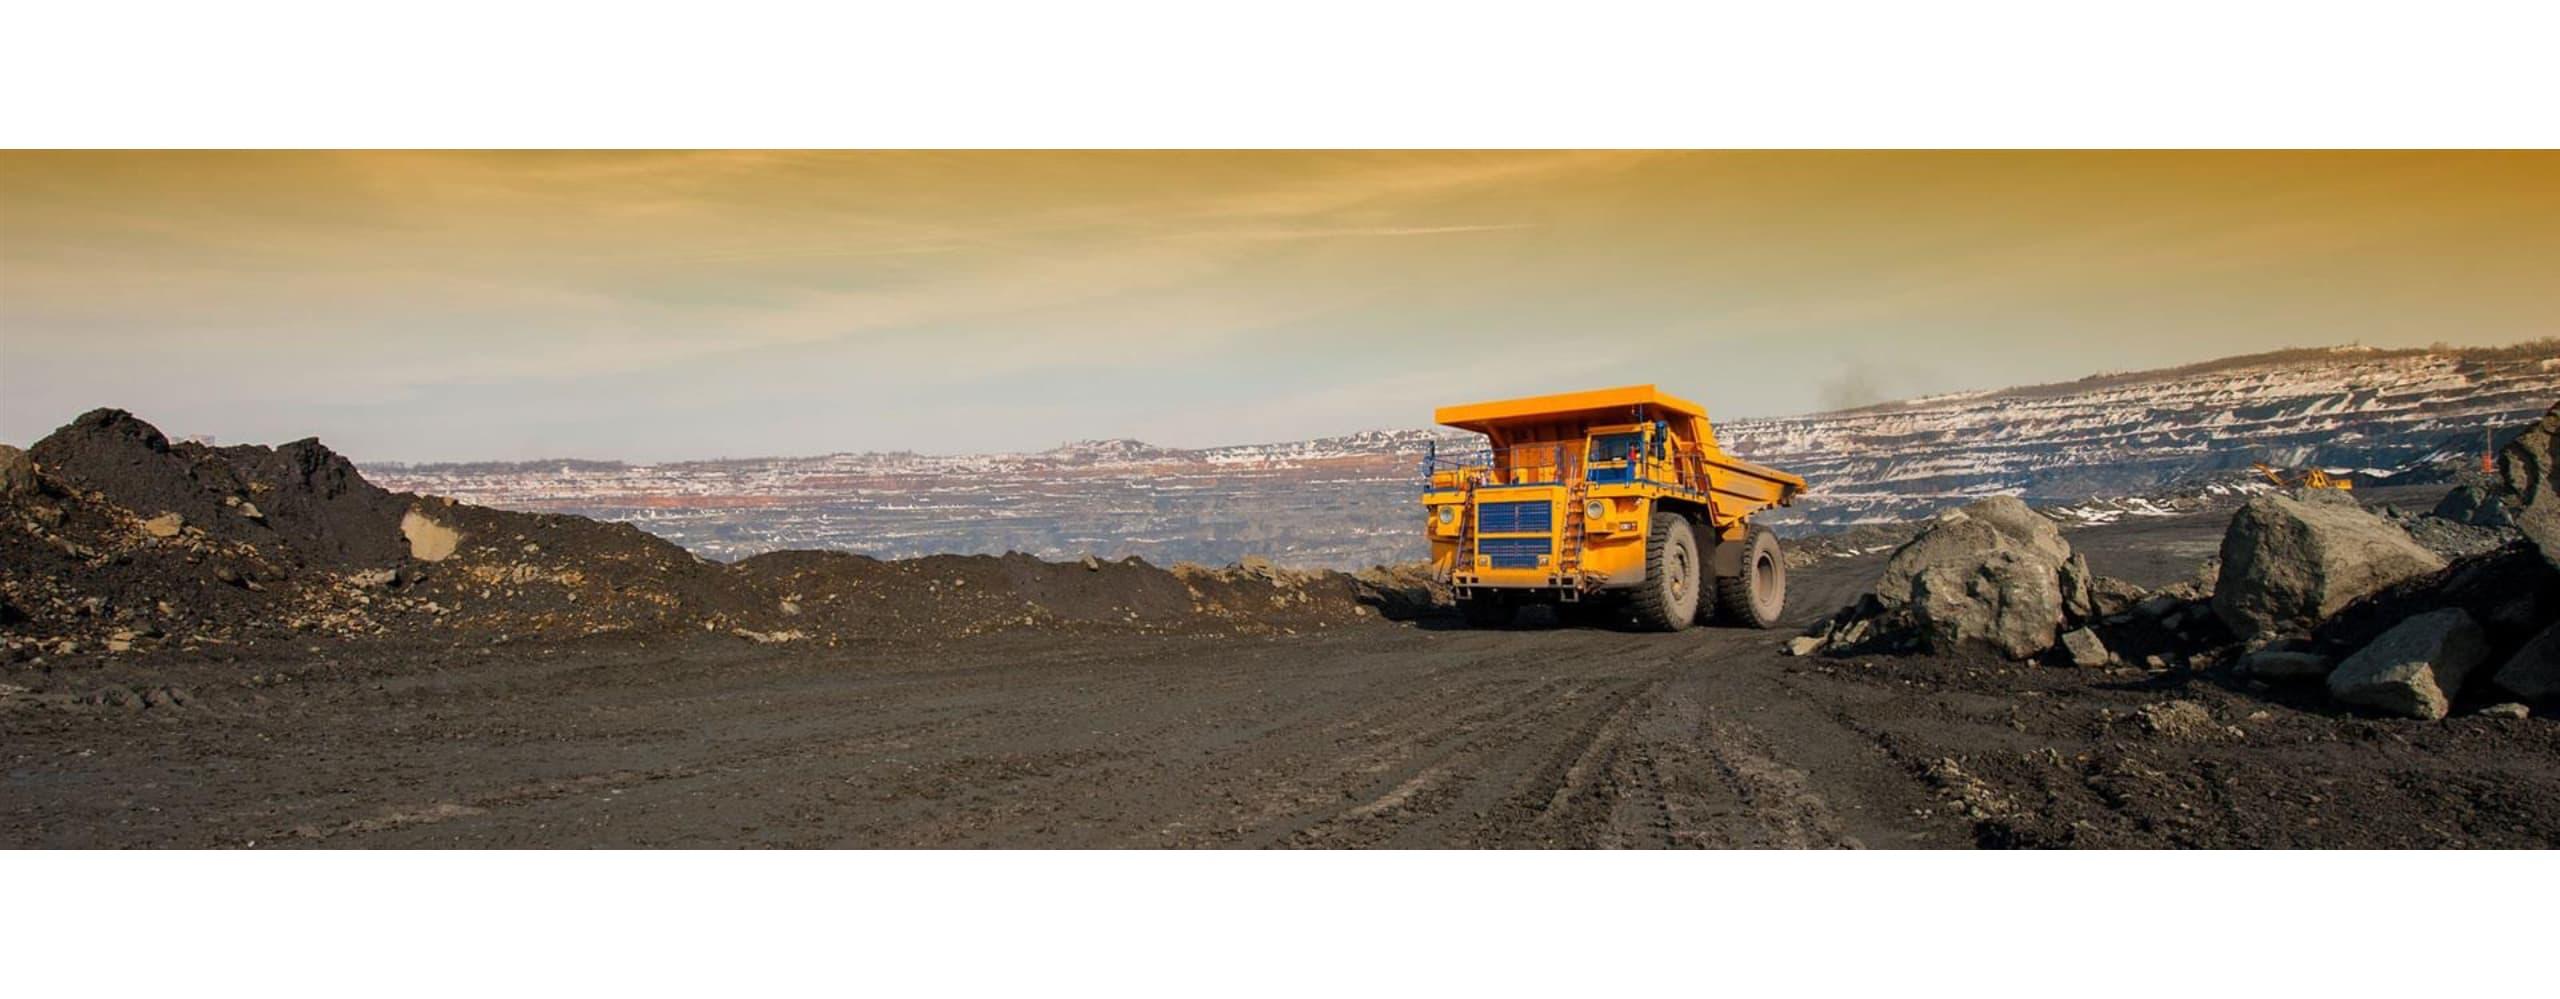 Mining truck sunset view